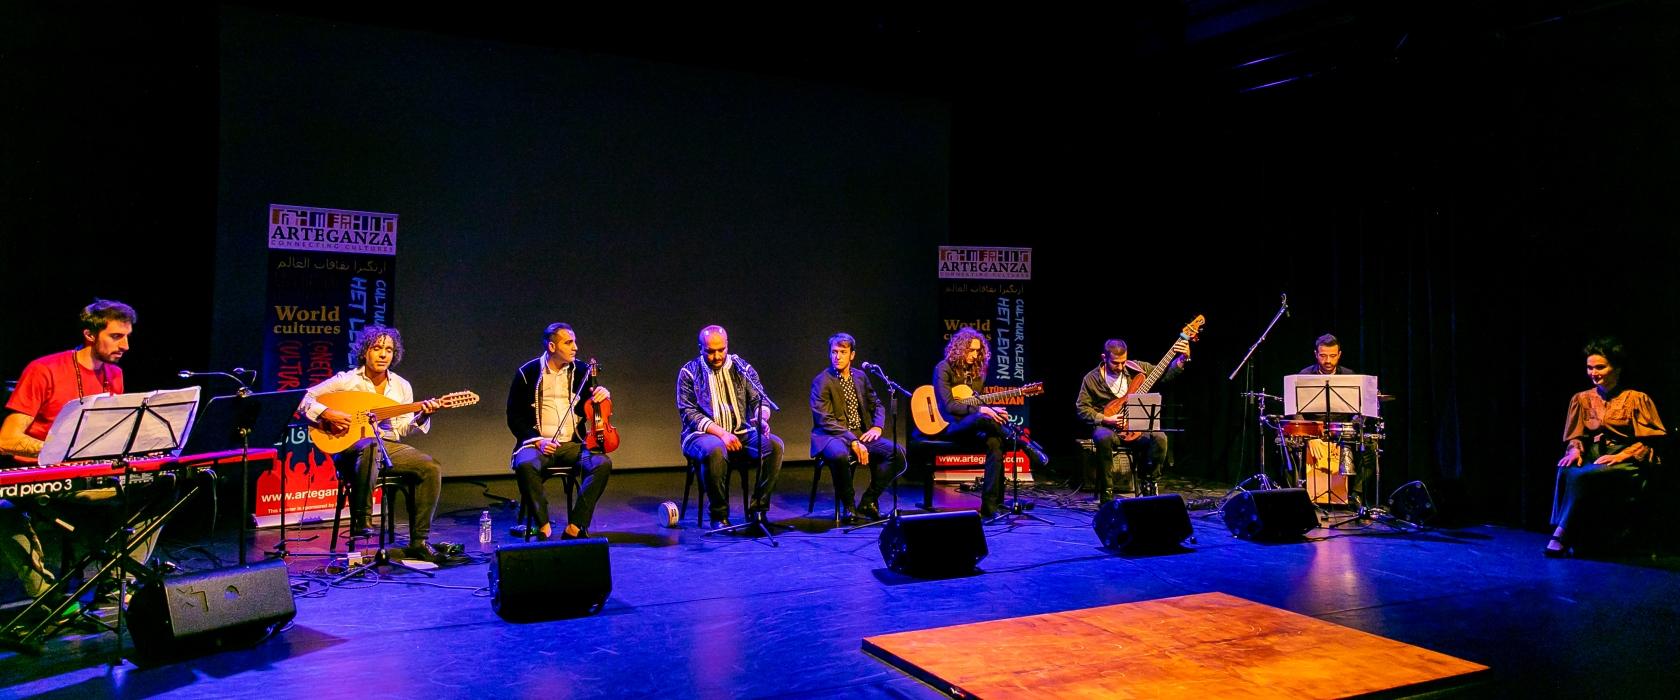 Musica Mundo series | de Nozem Fotografie Amersfoort